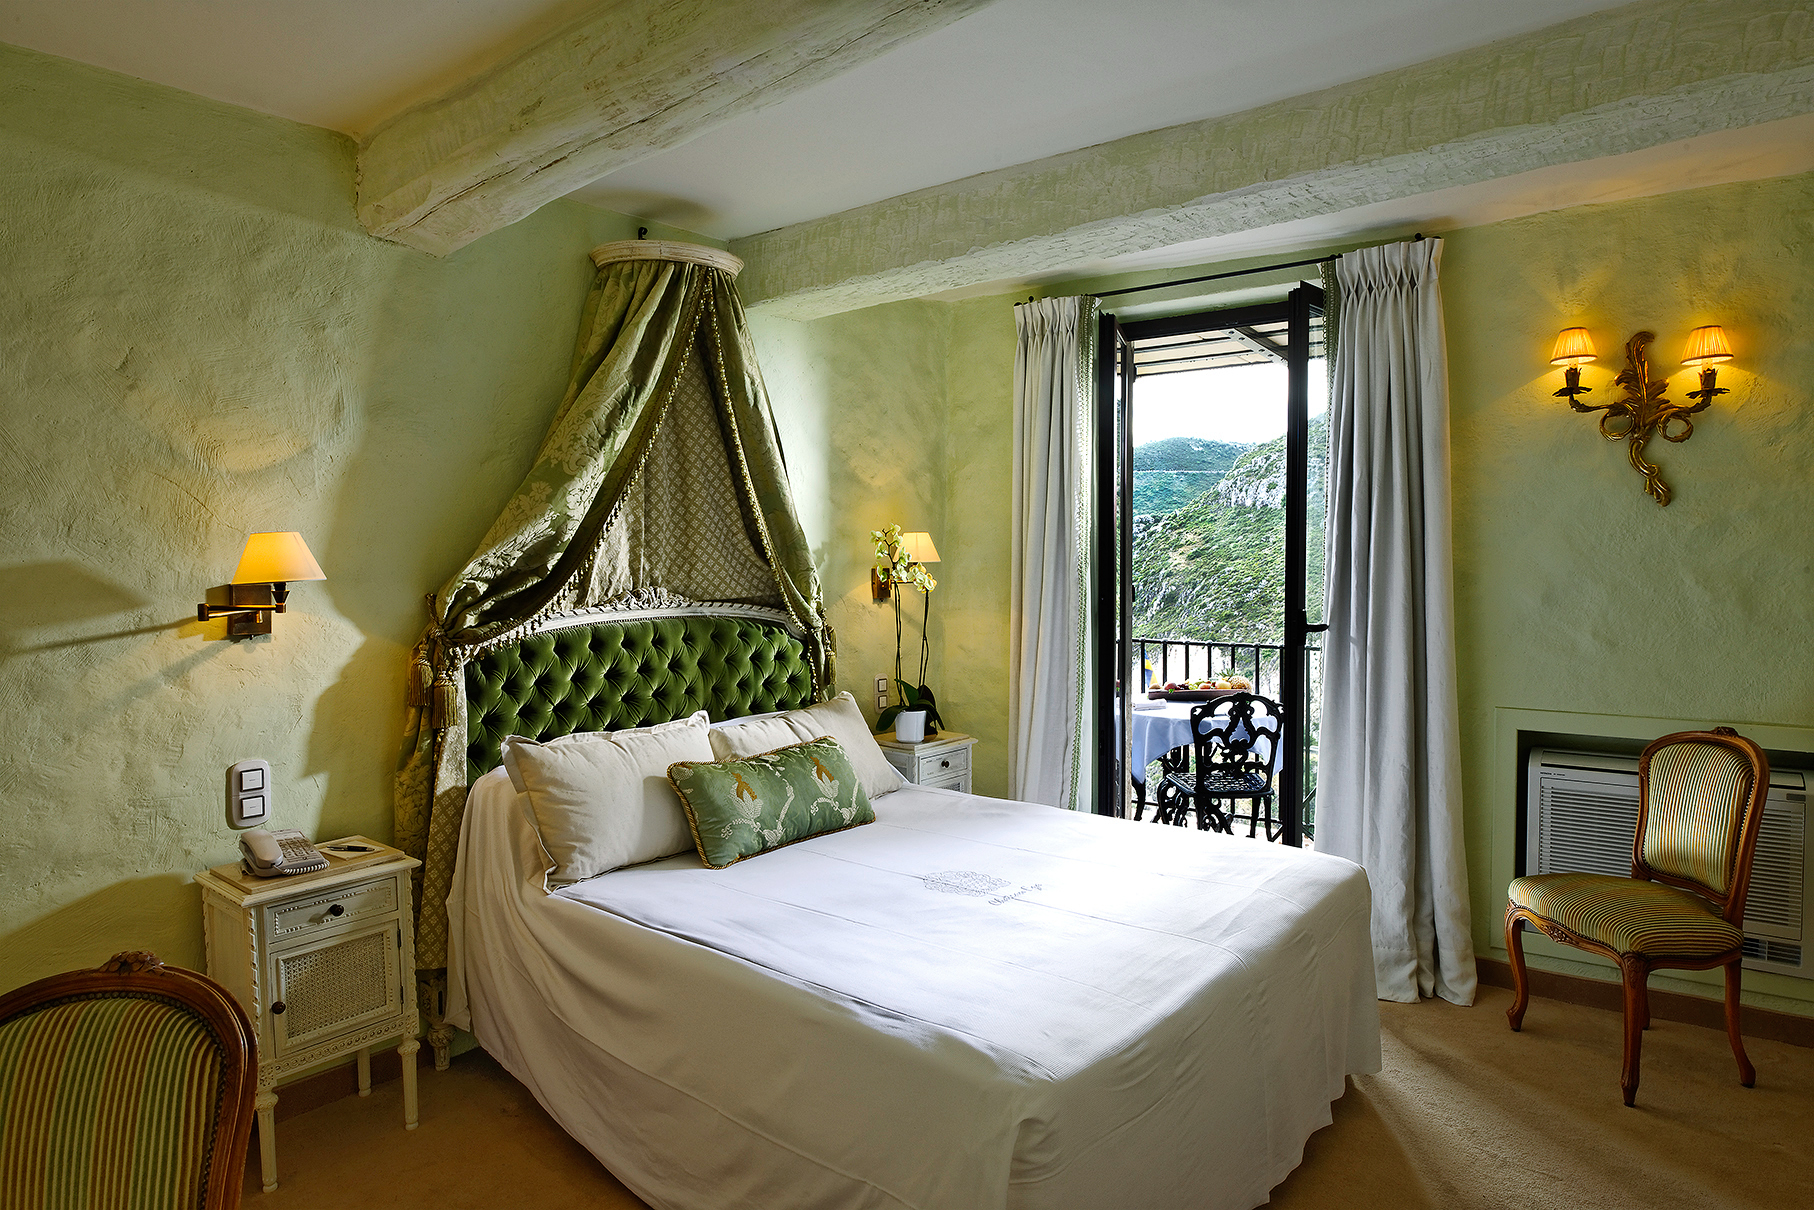 romantic destination chateau eza provence france